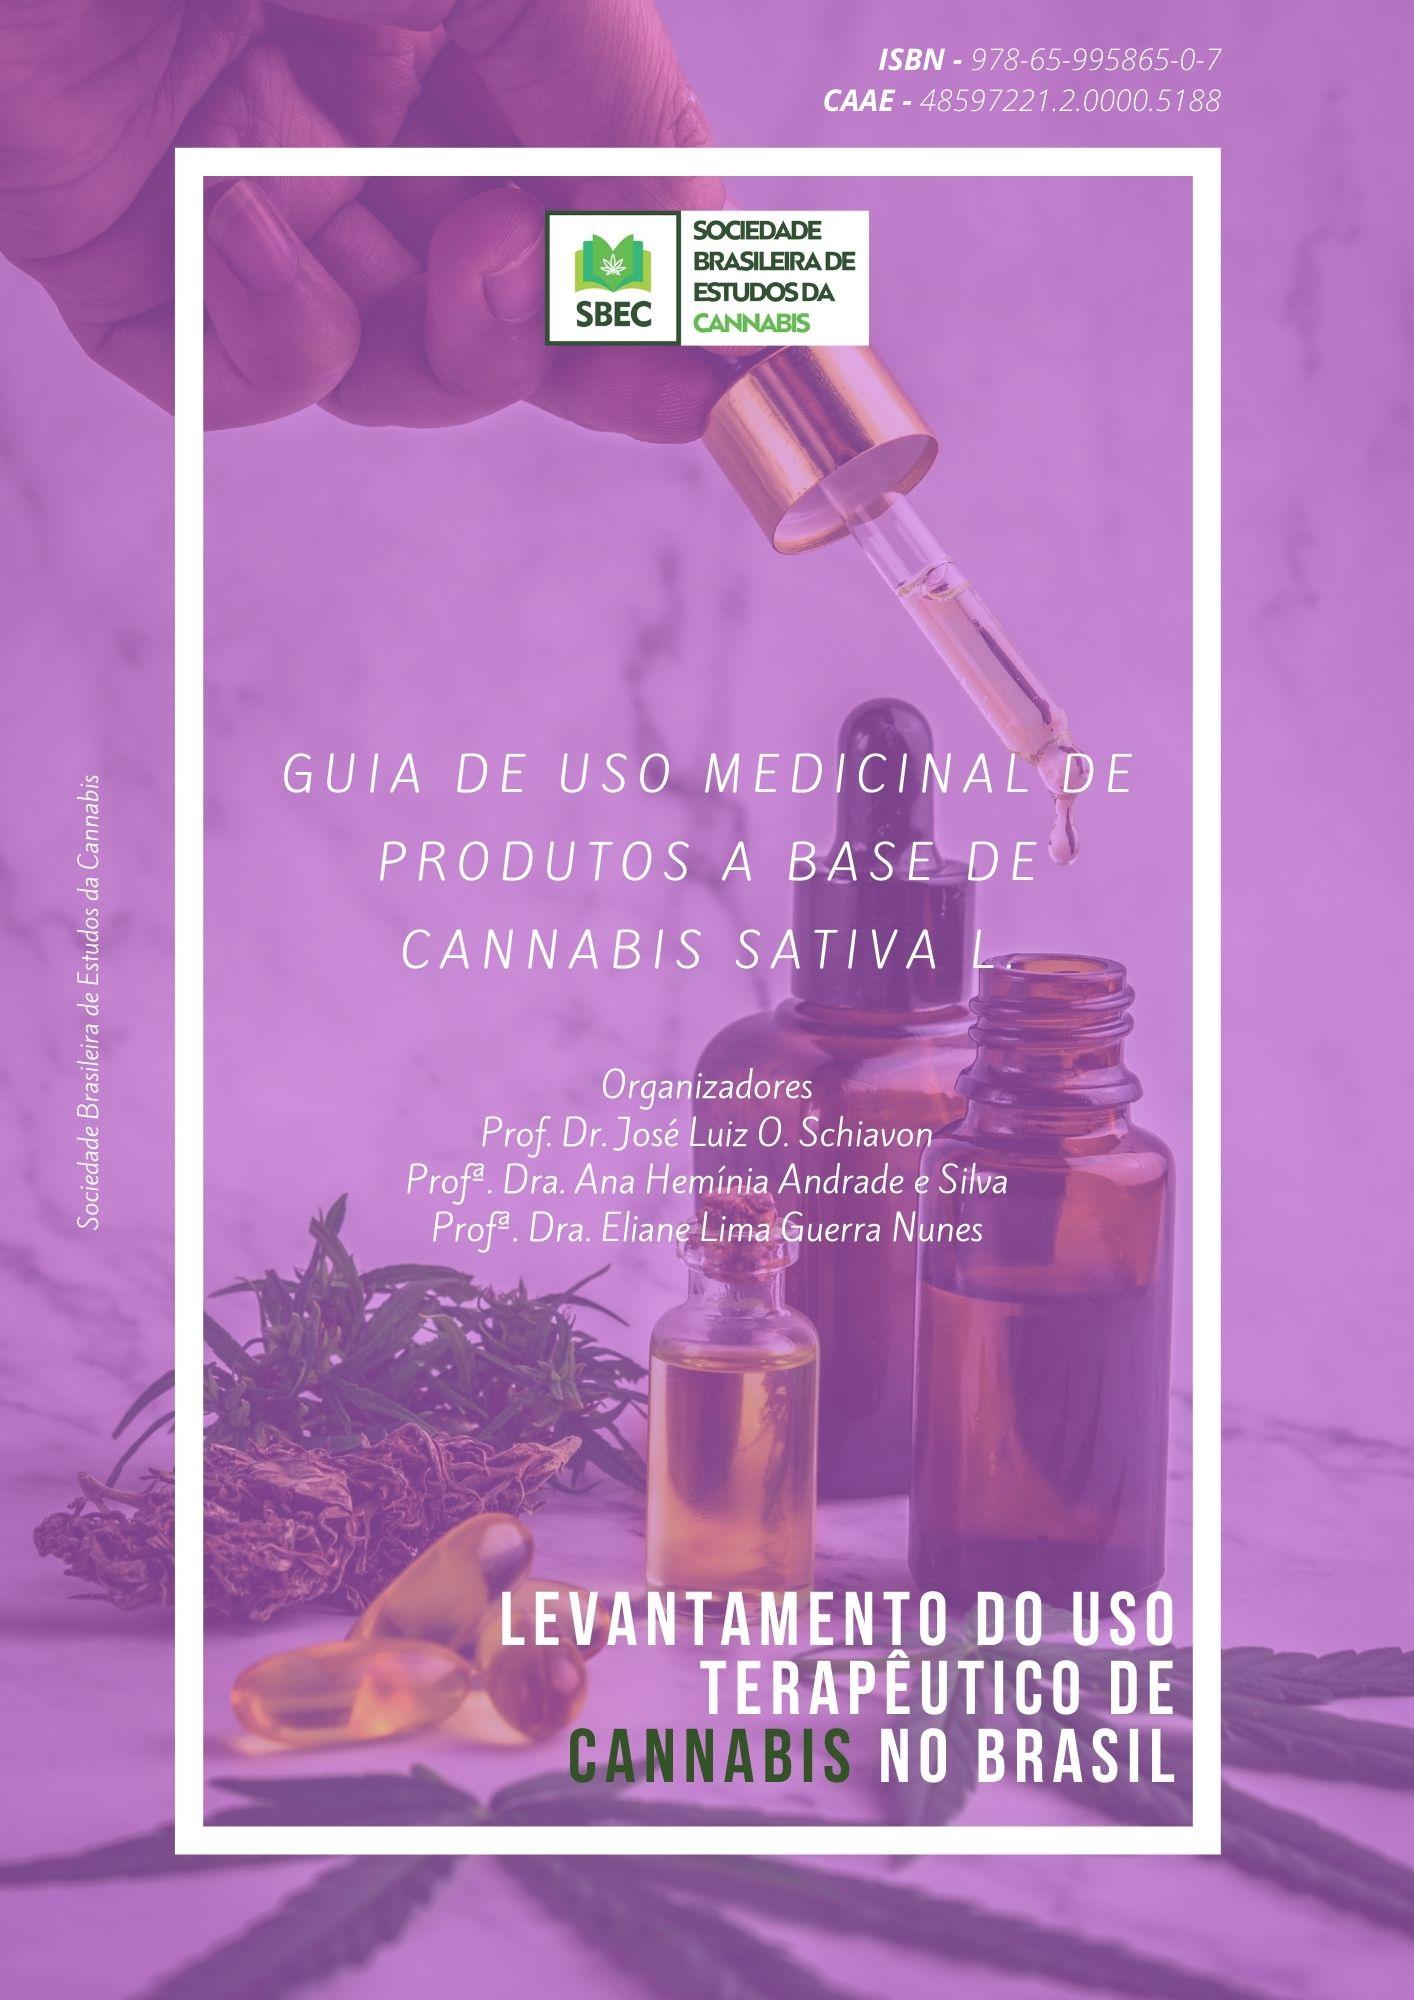 Guia de uso medicinal de cannabis 4